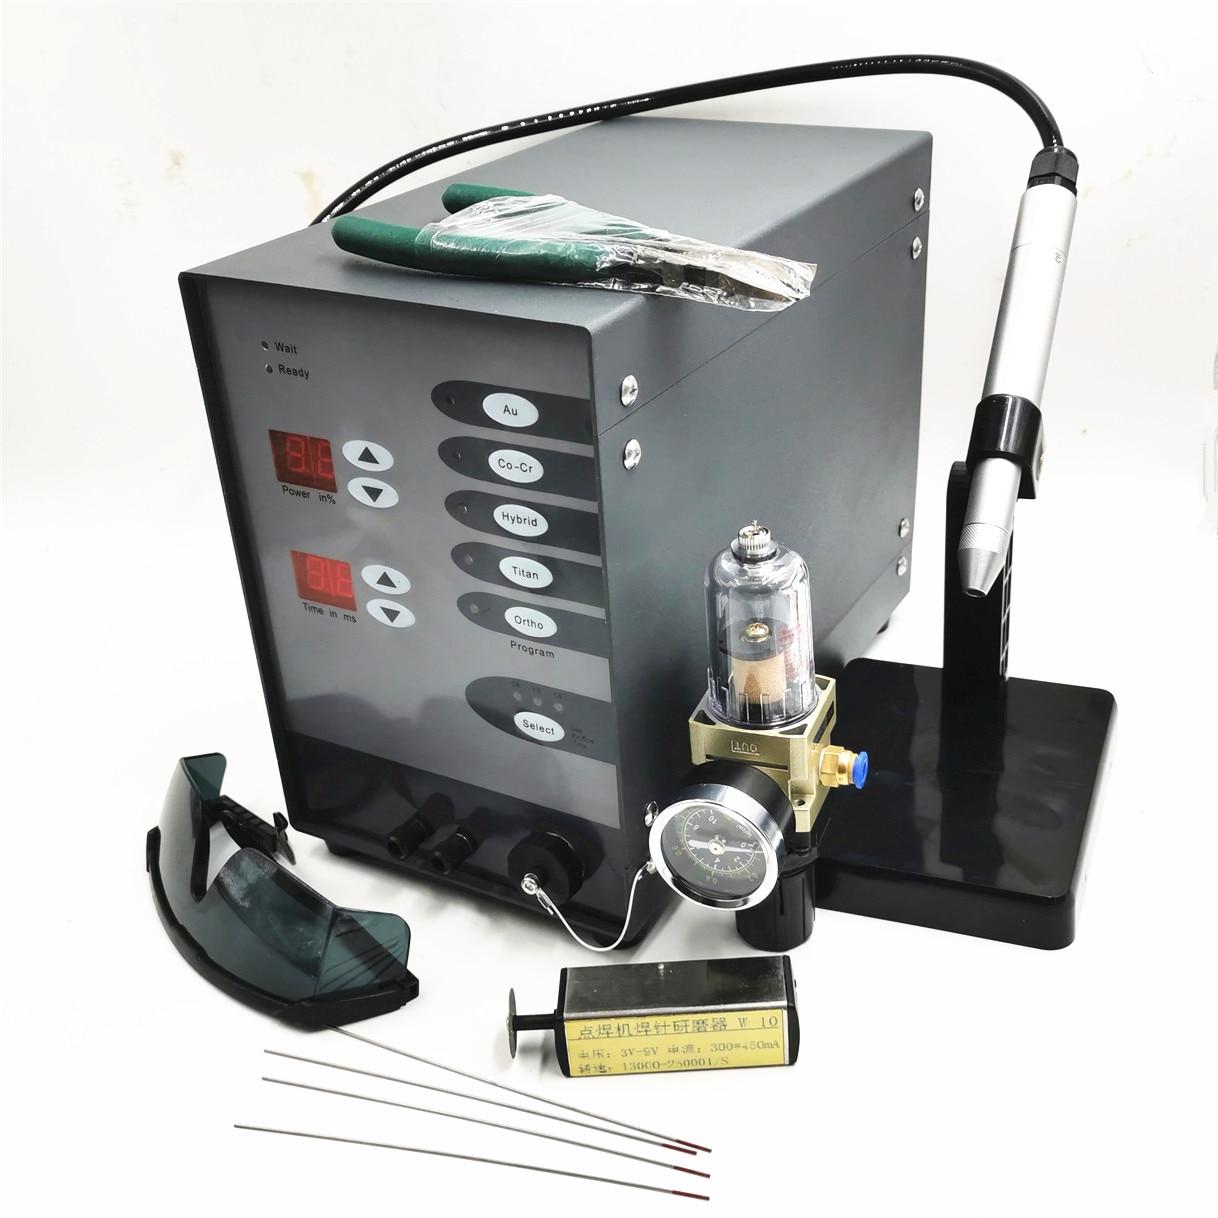 Stainless Steel Spot Welding Machine Laser Welding  Automatic Numerical Control Pulse Argon Arc Welder Jewelry Spot Welder